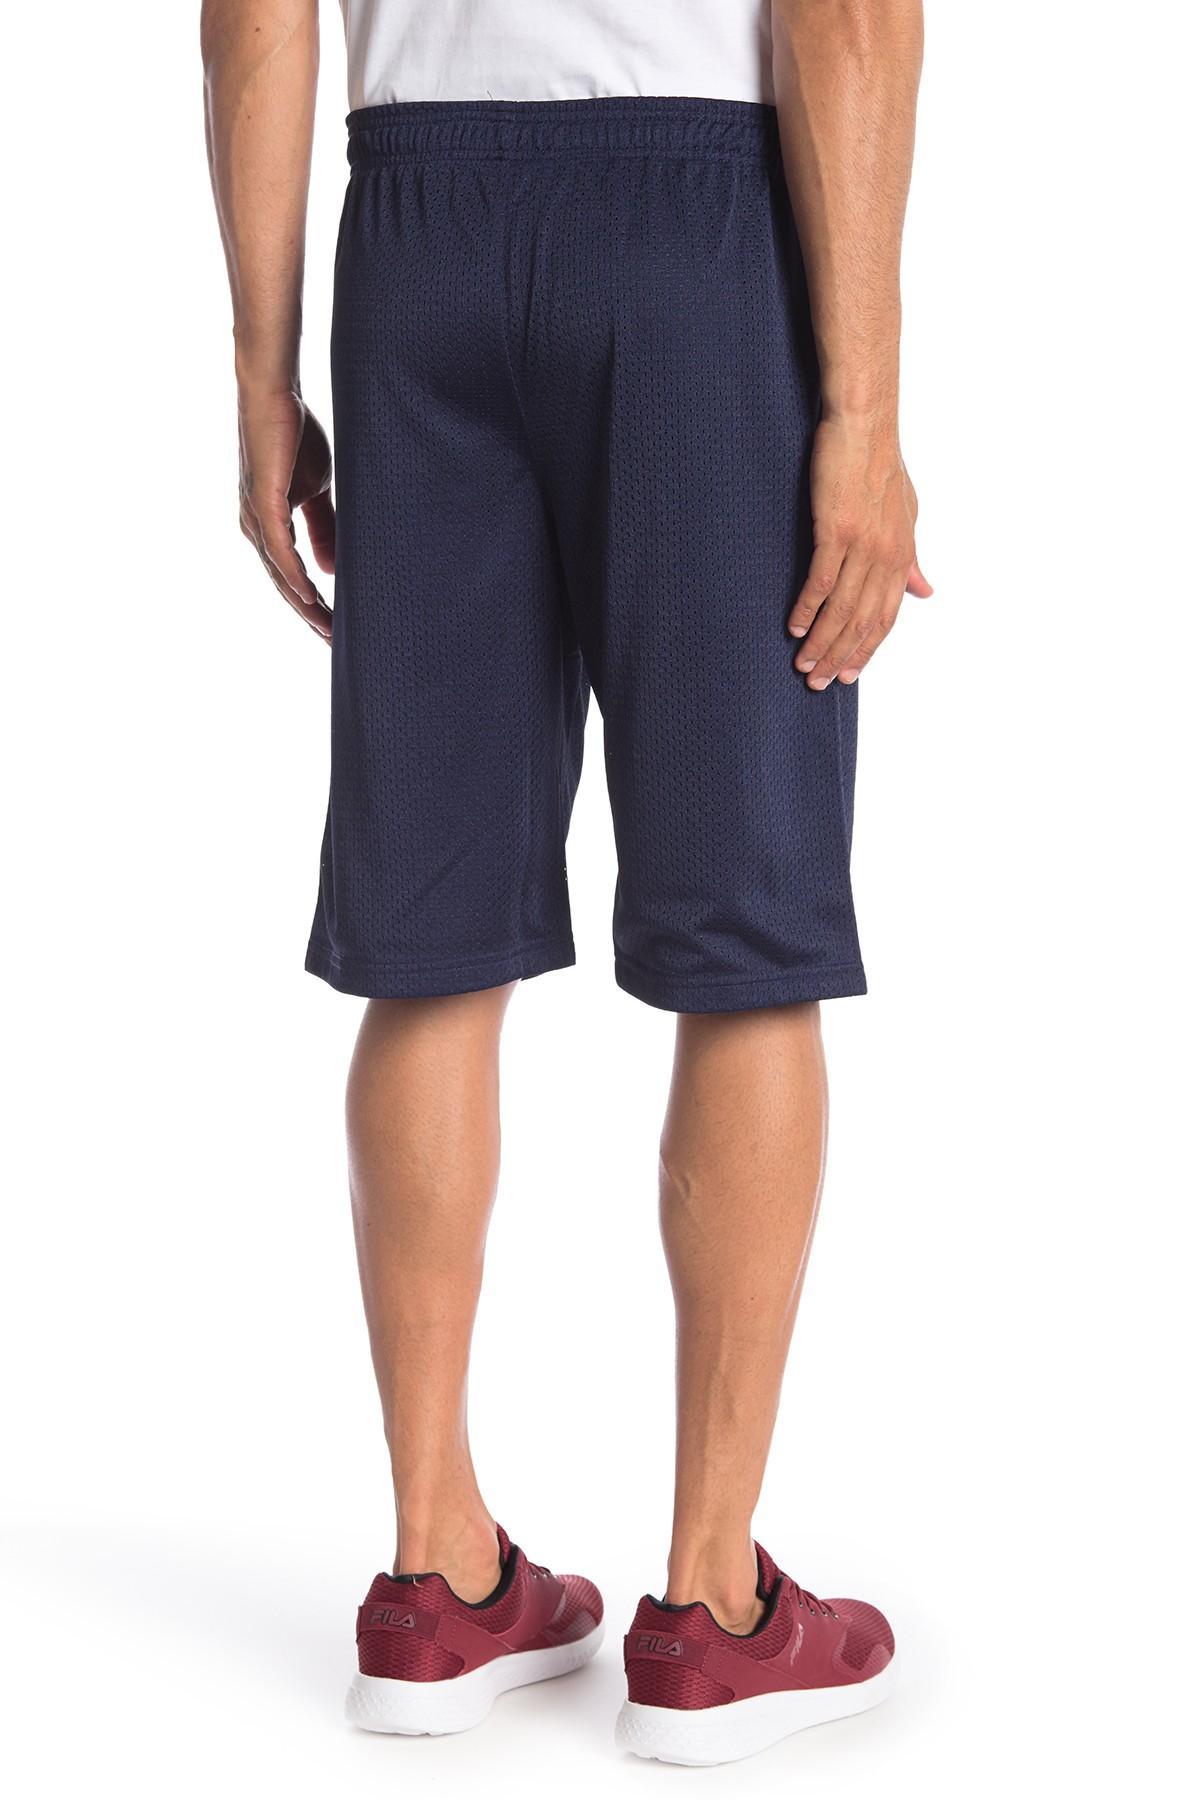 b5379606f6e84 Fila - Blue Dazzle Mesh Shorts for Men - Lyst. View fullscreen